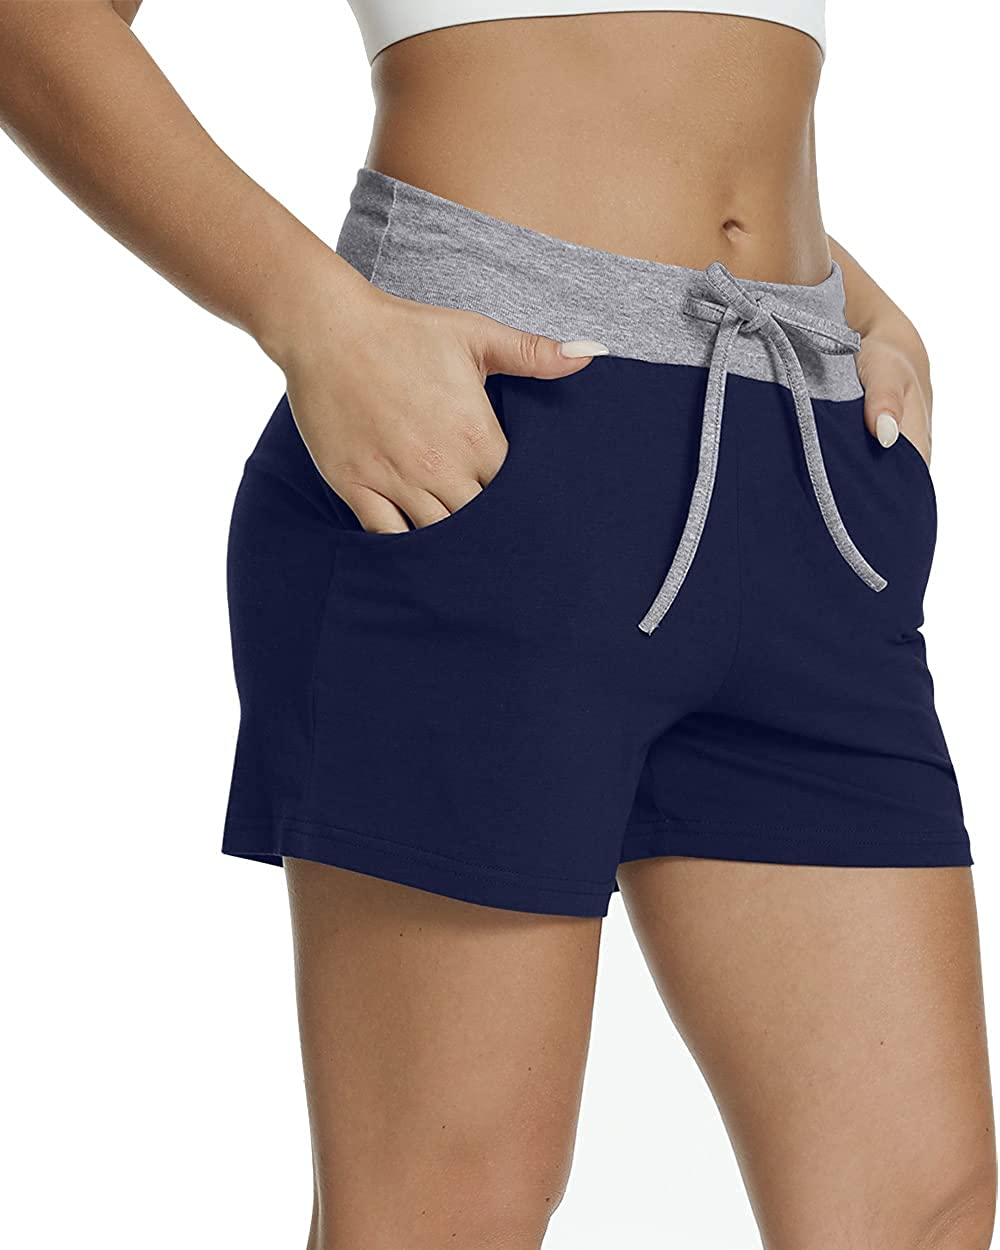 CATHY Women's Summer Casual Athletic Shorts Drawstring Loungewear Pants Elastic Comfy Pajama Shorts